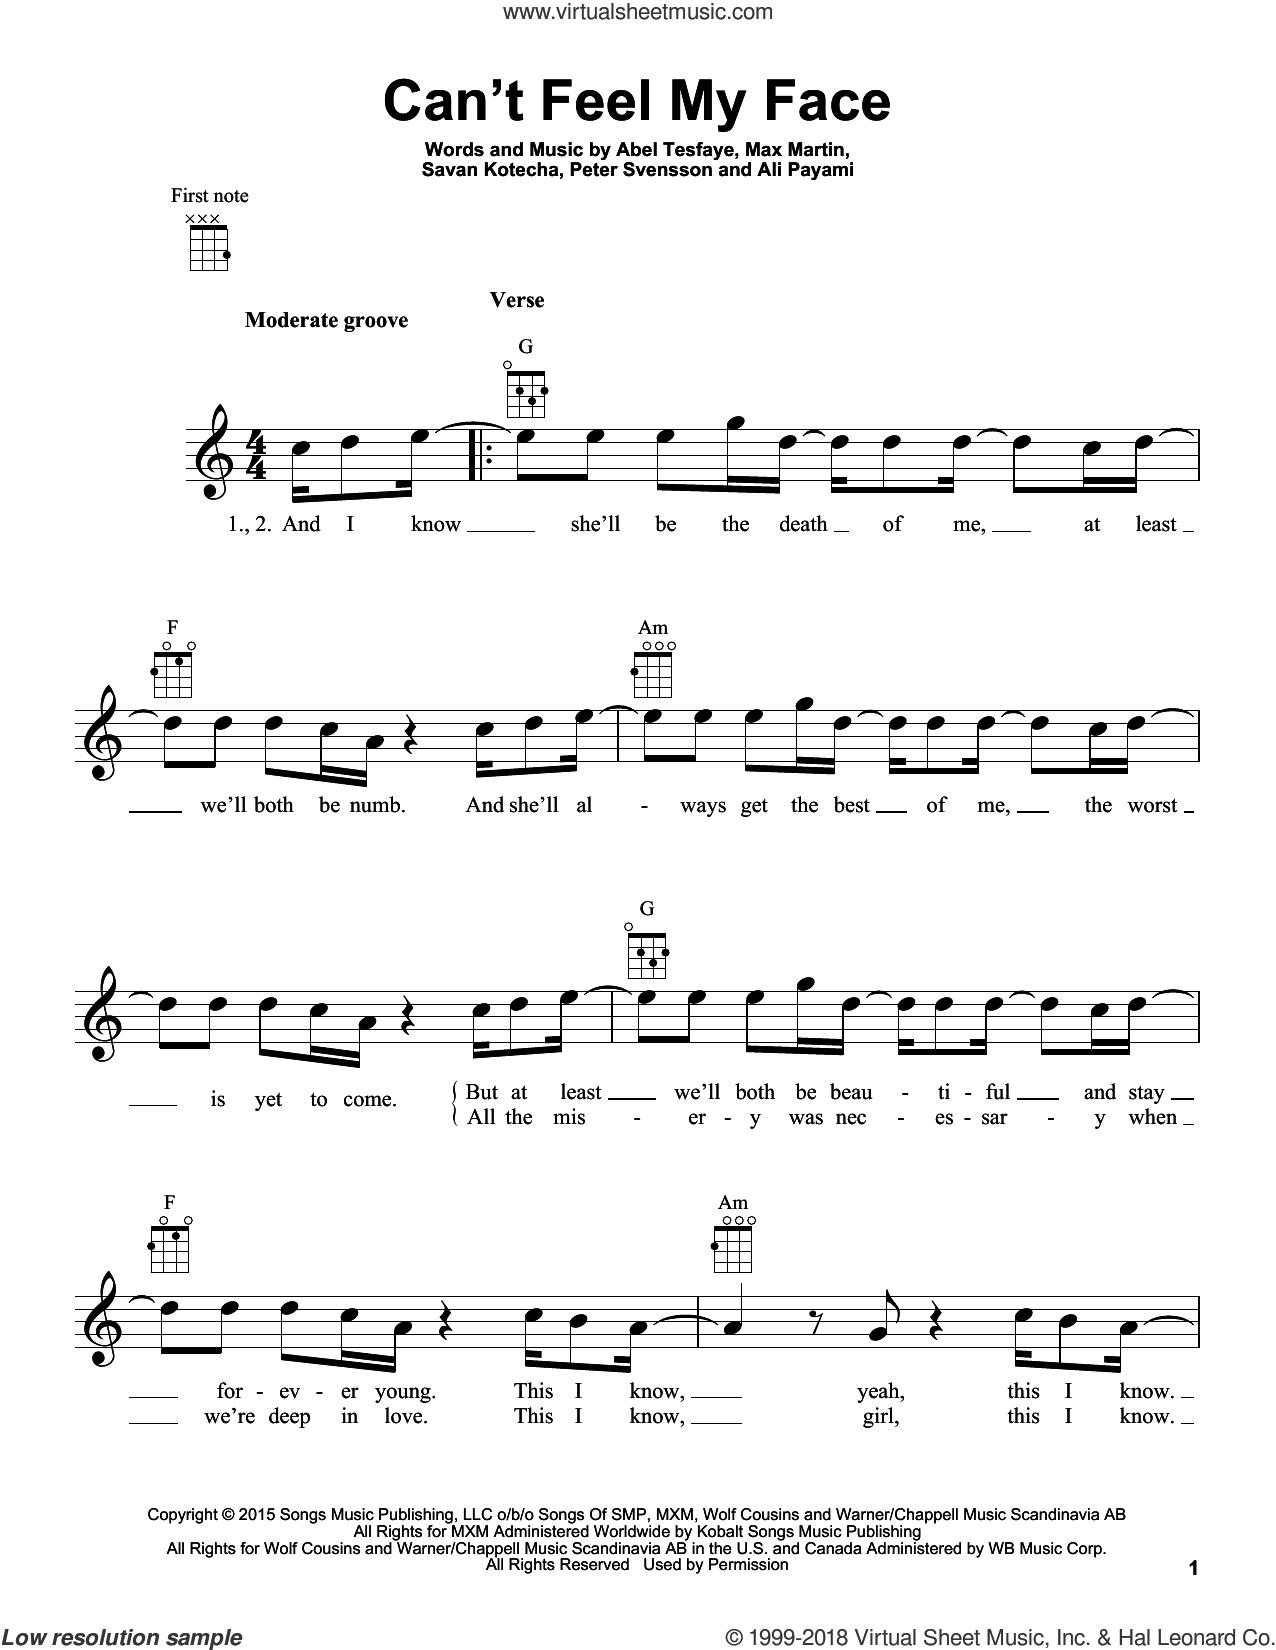 Can't Feel My Face sheet music for ukulele by The Weeknd, Abel Tesfaye, Ali Payami, Max Martin, Peter Svensson and Savan Kotecha, intermediate skill level